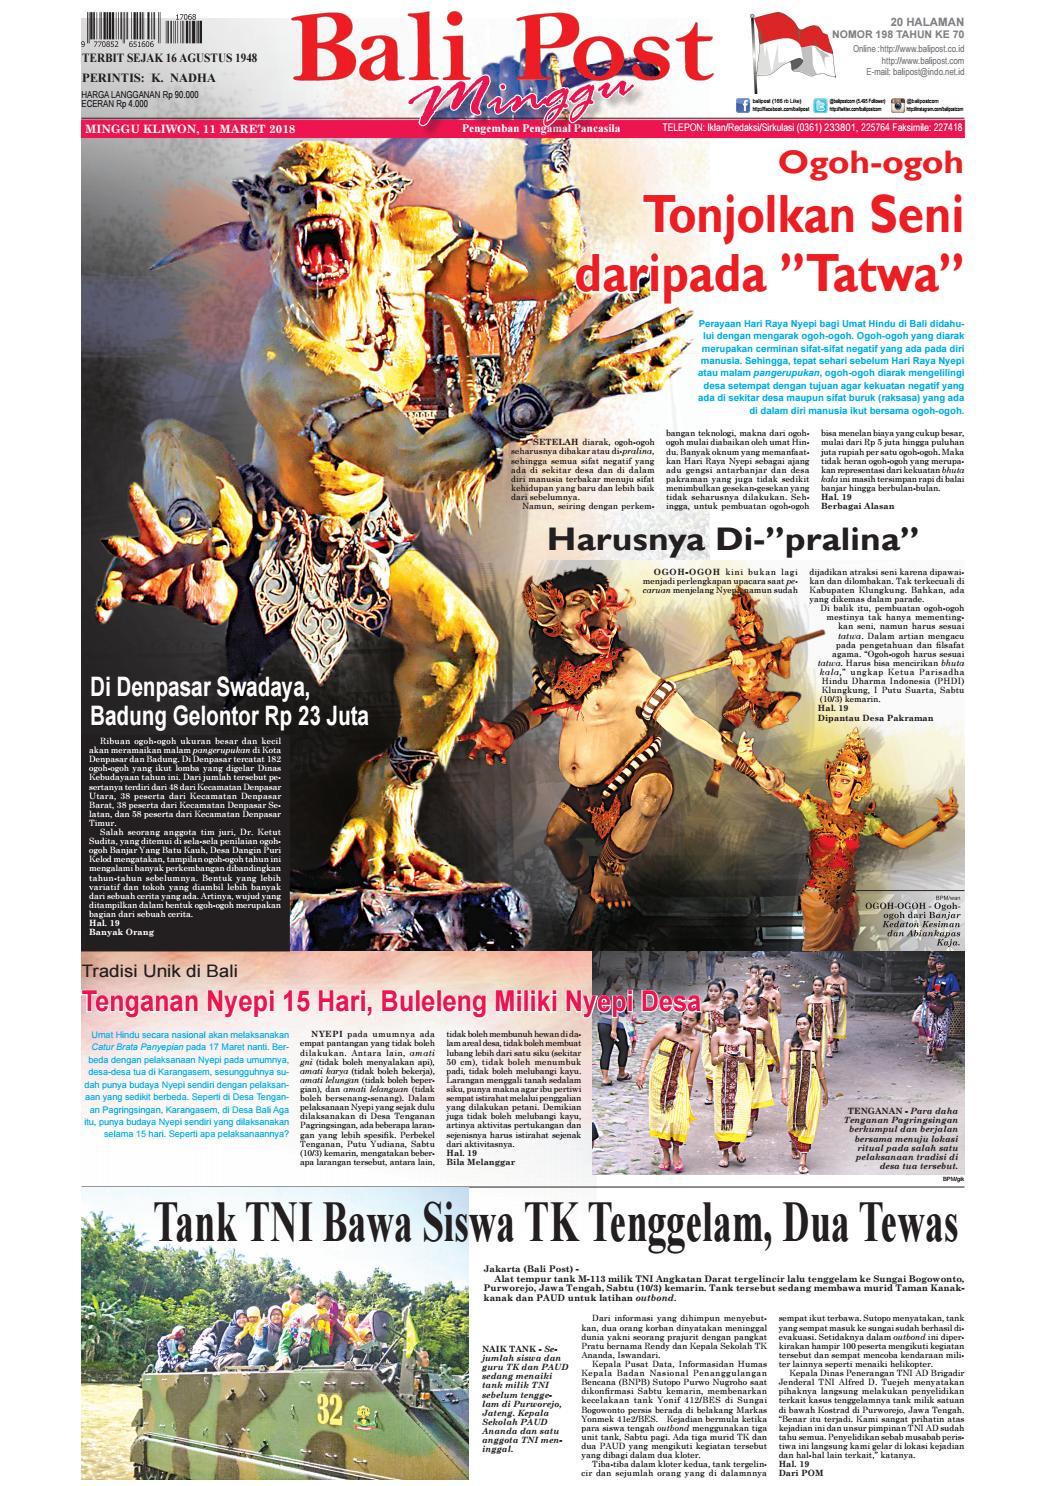 Edisi Selasa 11 Maret 2018 Balipostcom By E Paper KMB Issuu